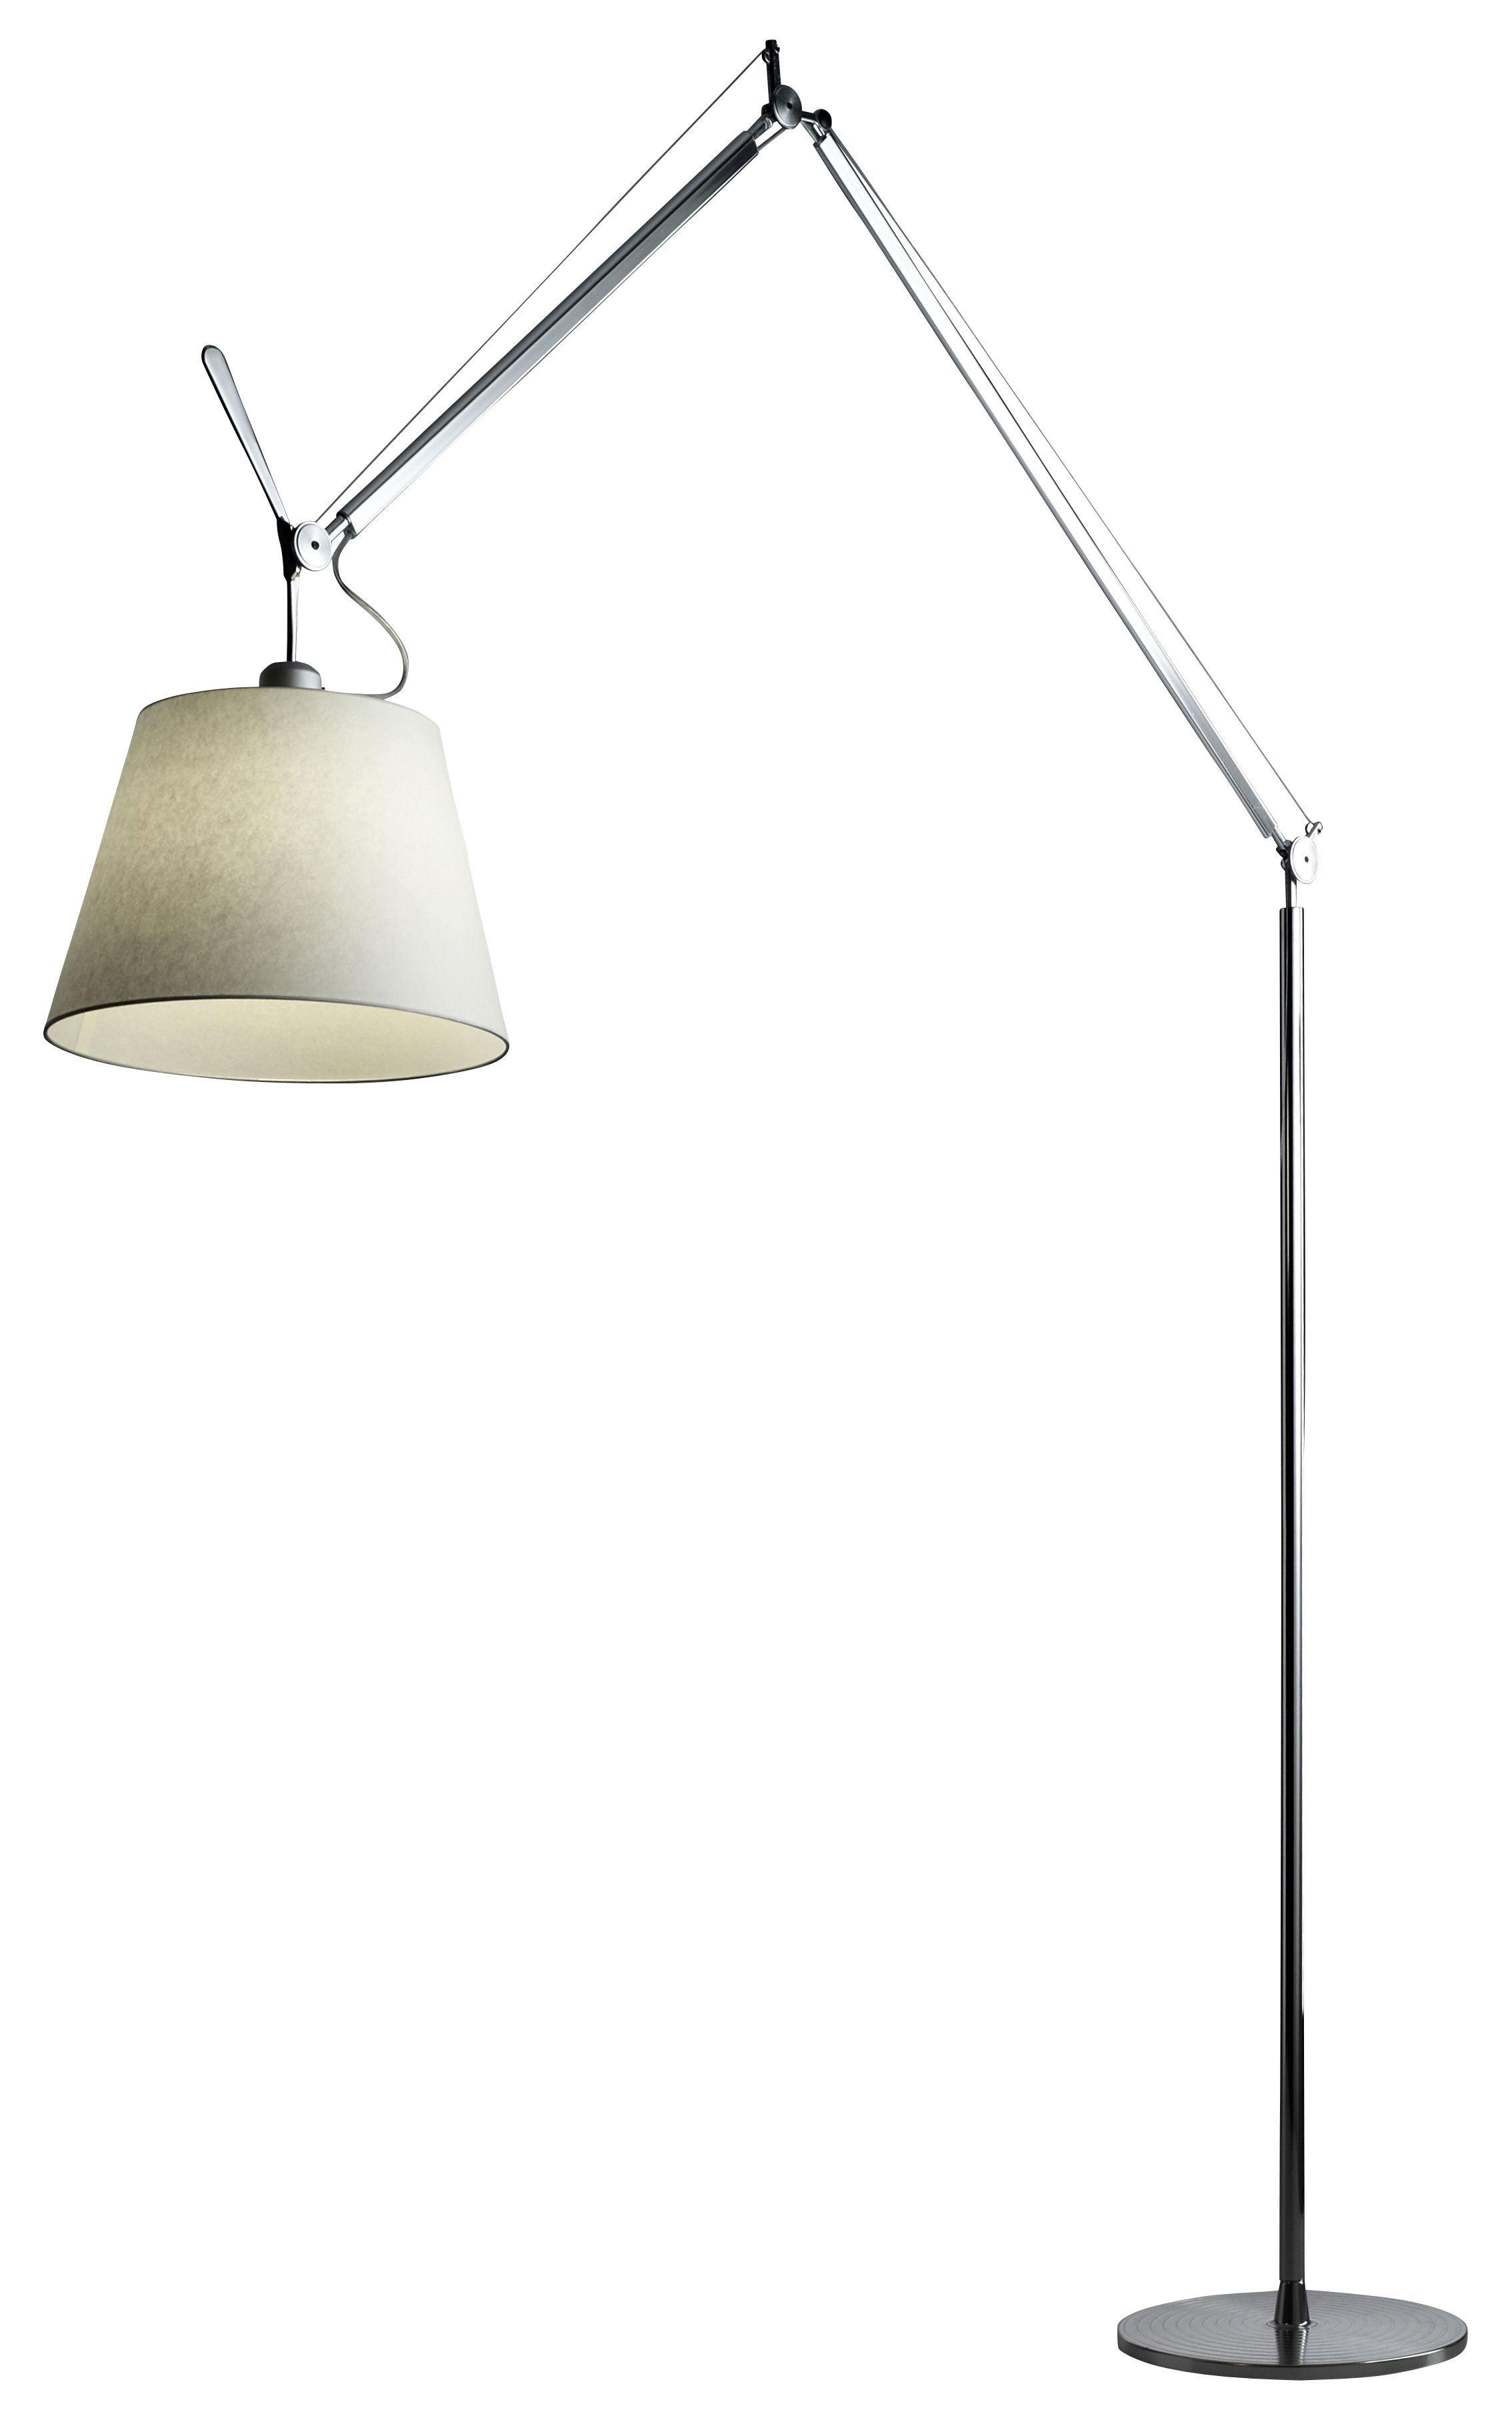 tolomeo mega floor lamp h 148 to 327 cm diffuser 42 cm. Black Bedroom Furniture Sets. Home Design Ideas